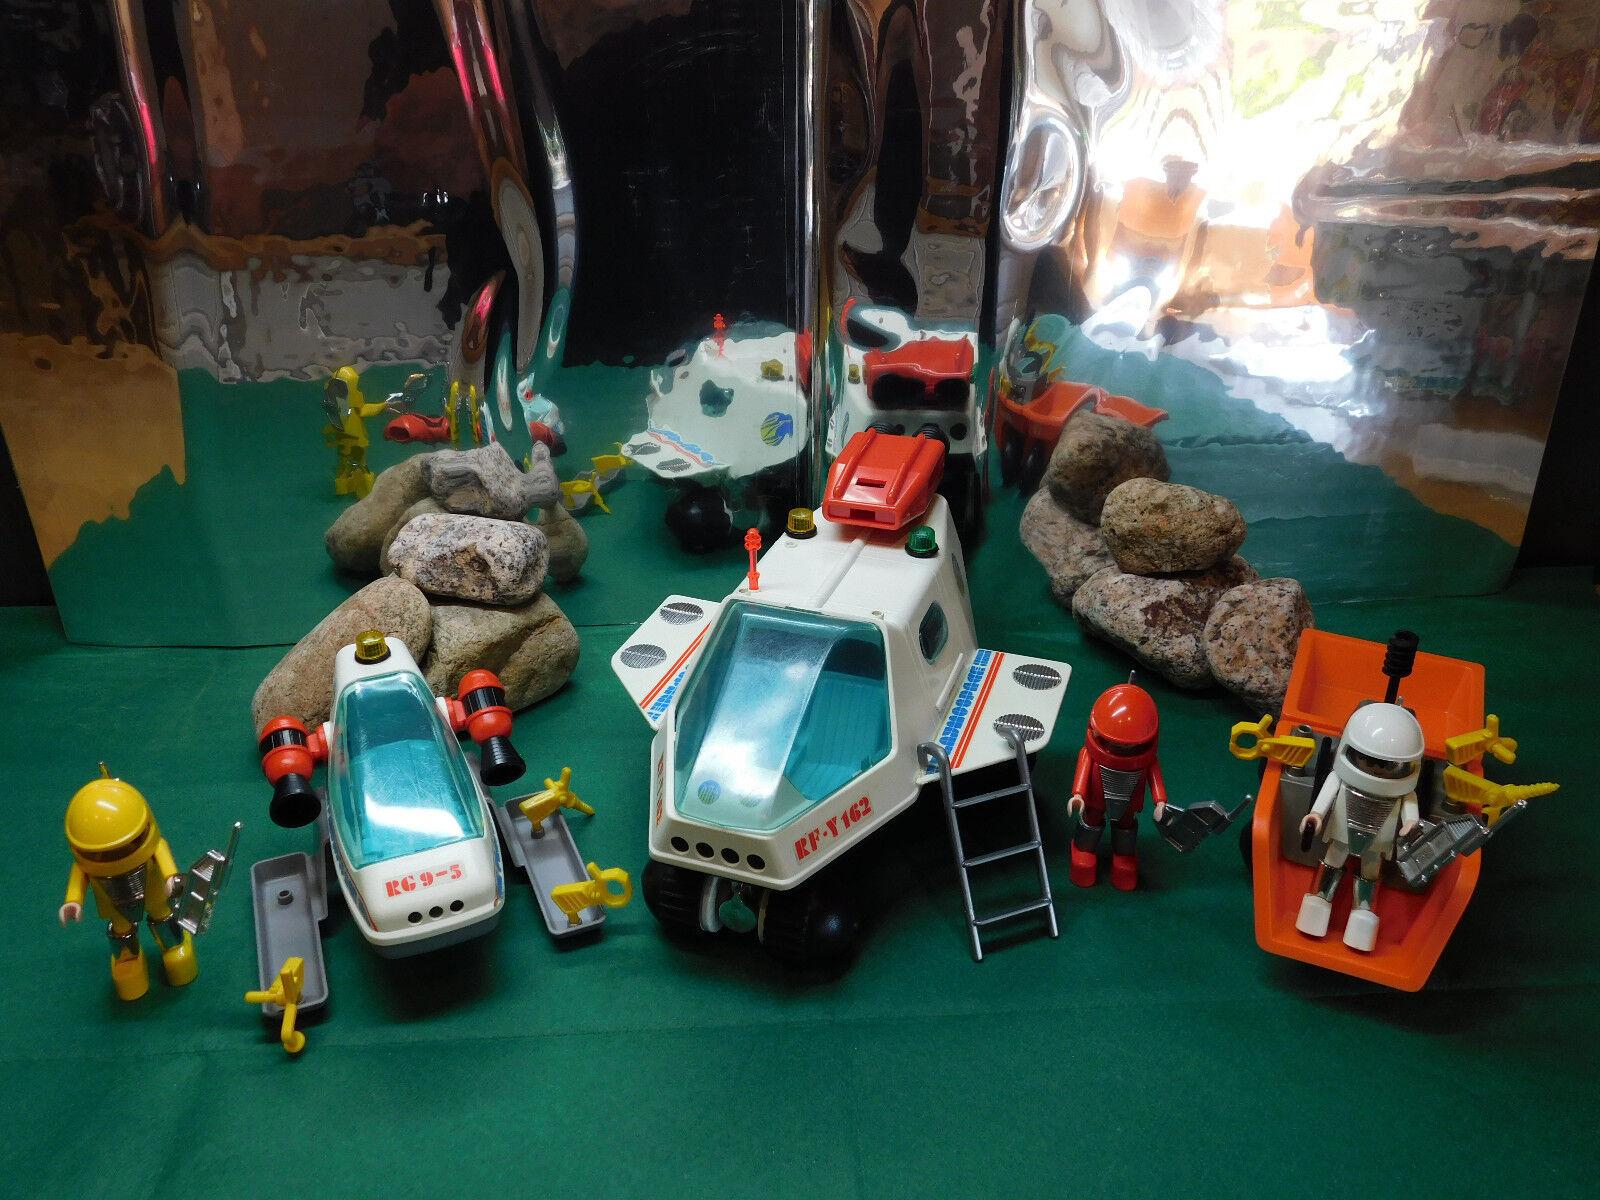 Playmobil Space-Set: Raumfähre 3509, 3534, Raumgleiter 3509, Raumfähre Space-Transporter 3558 f5207f